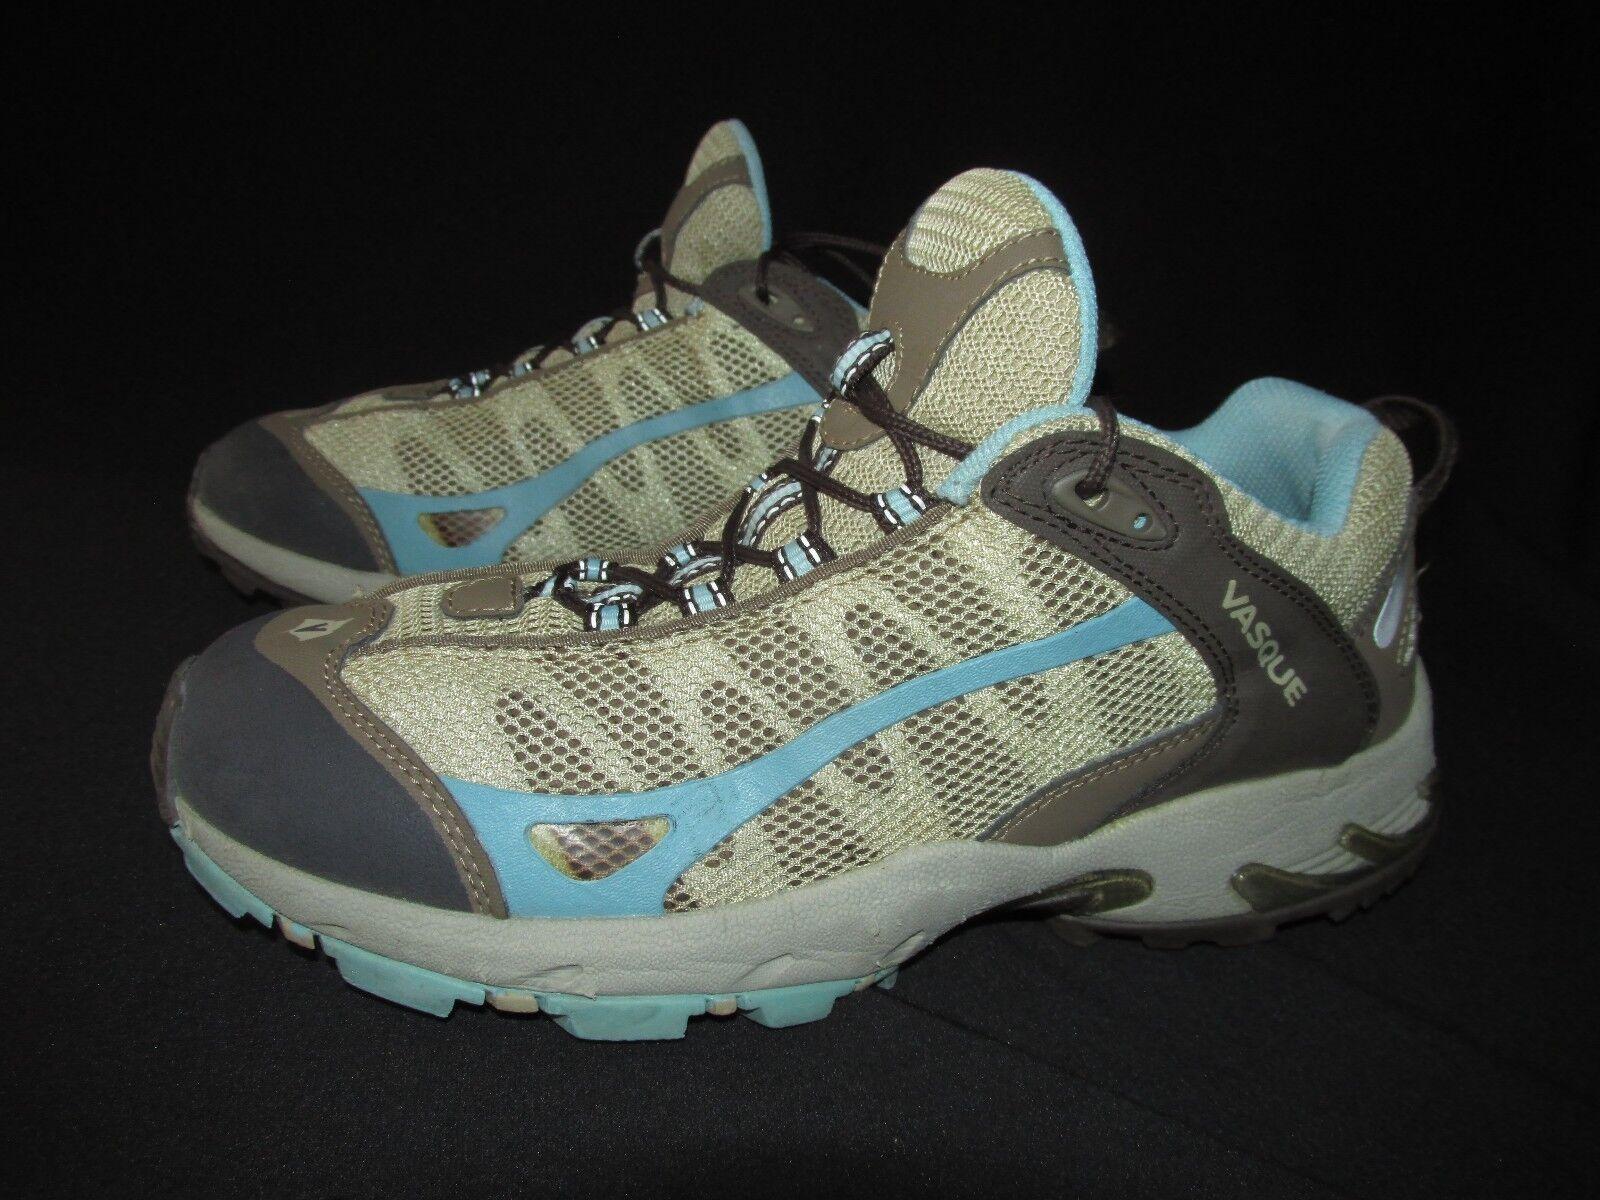 Vasque Tan Brown bleu Low Synthetic Mesh Hiking Trail  Chaussures femmes  9.5M